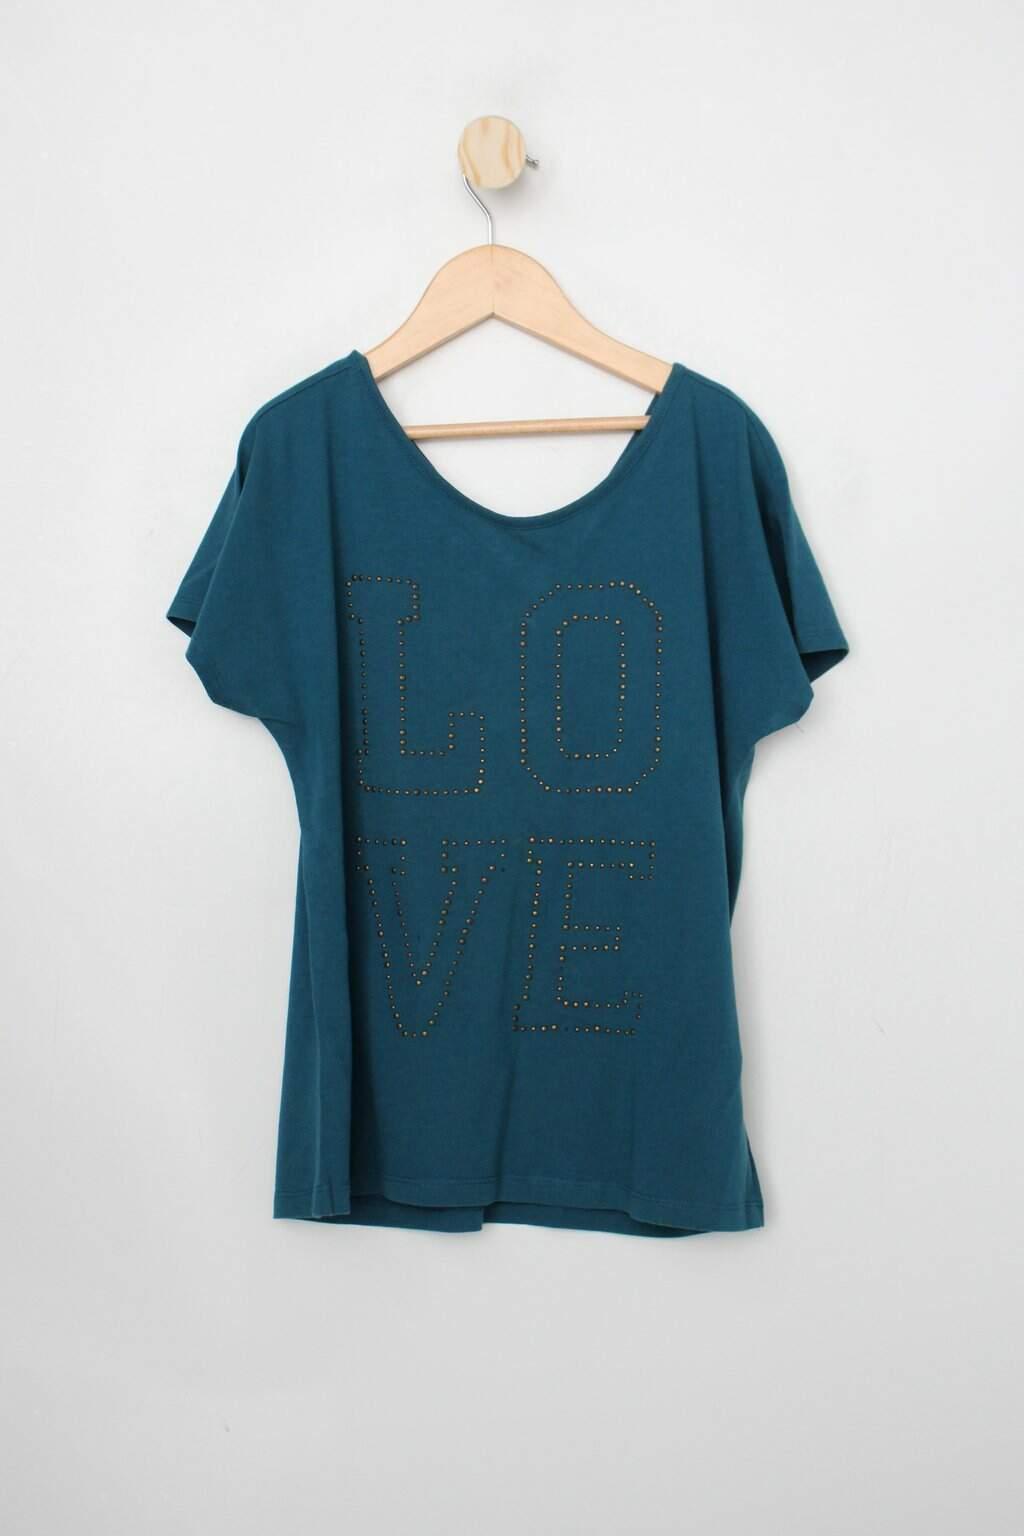 Blusa Infantil Zara Verde Esmeralda Com Hotfix